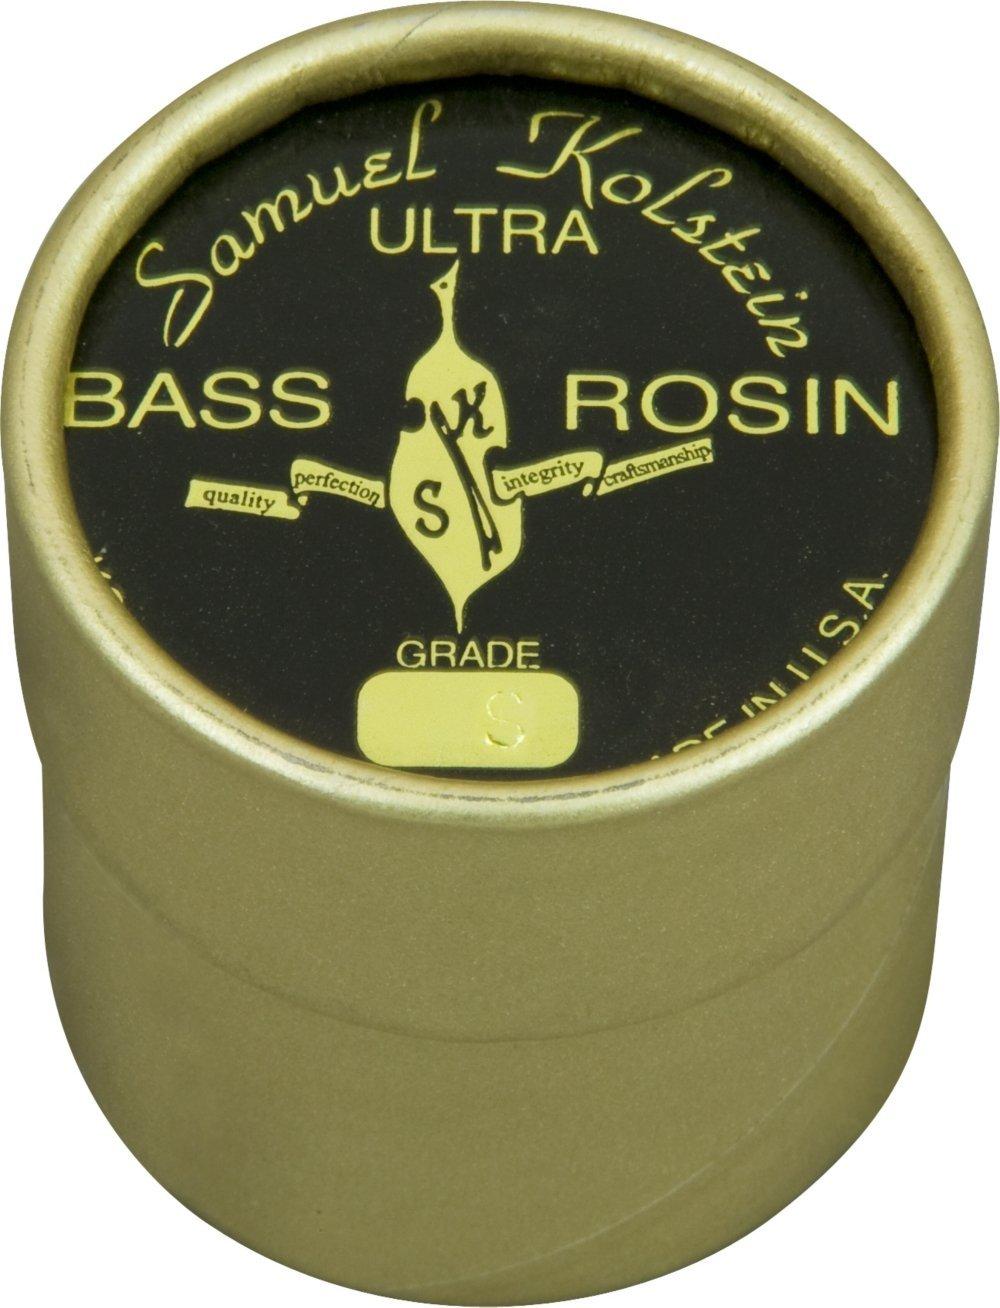 Kolstein Bass Rosin- Soft